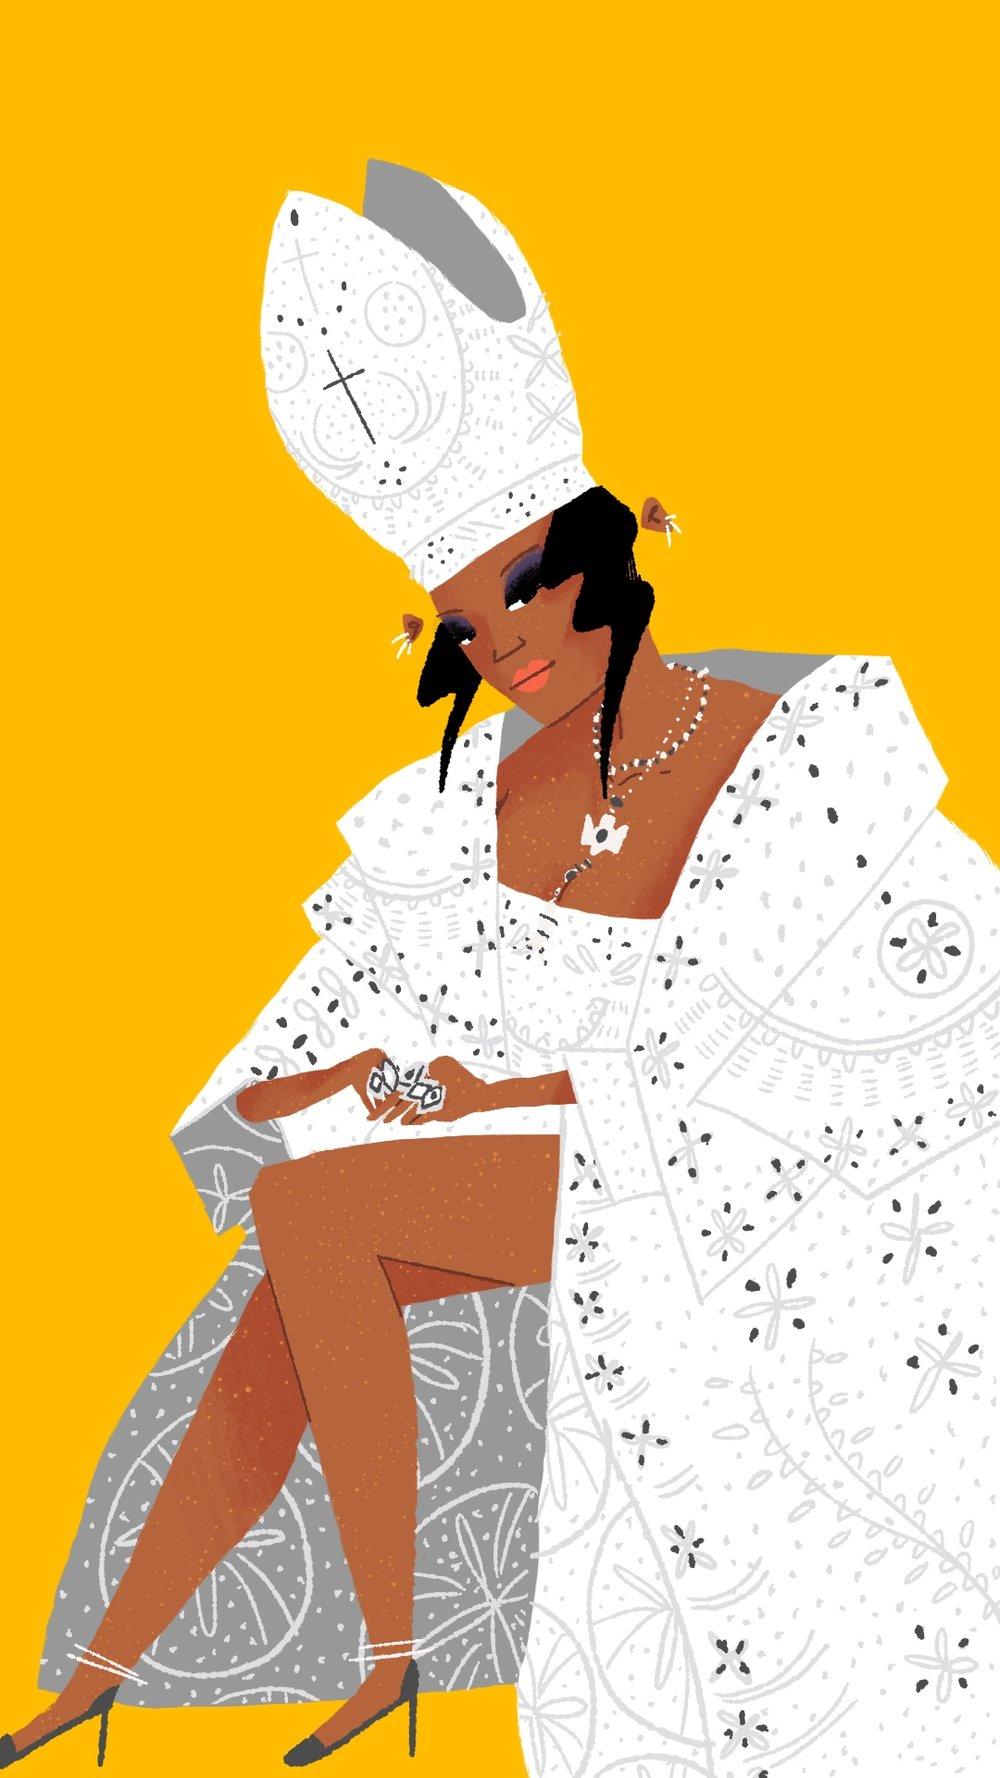 Pope Rihanna by Steph Coathupe